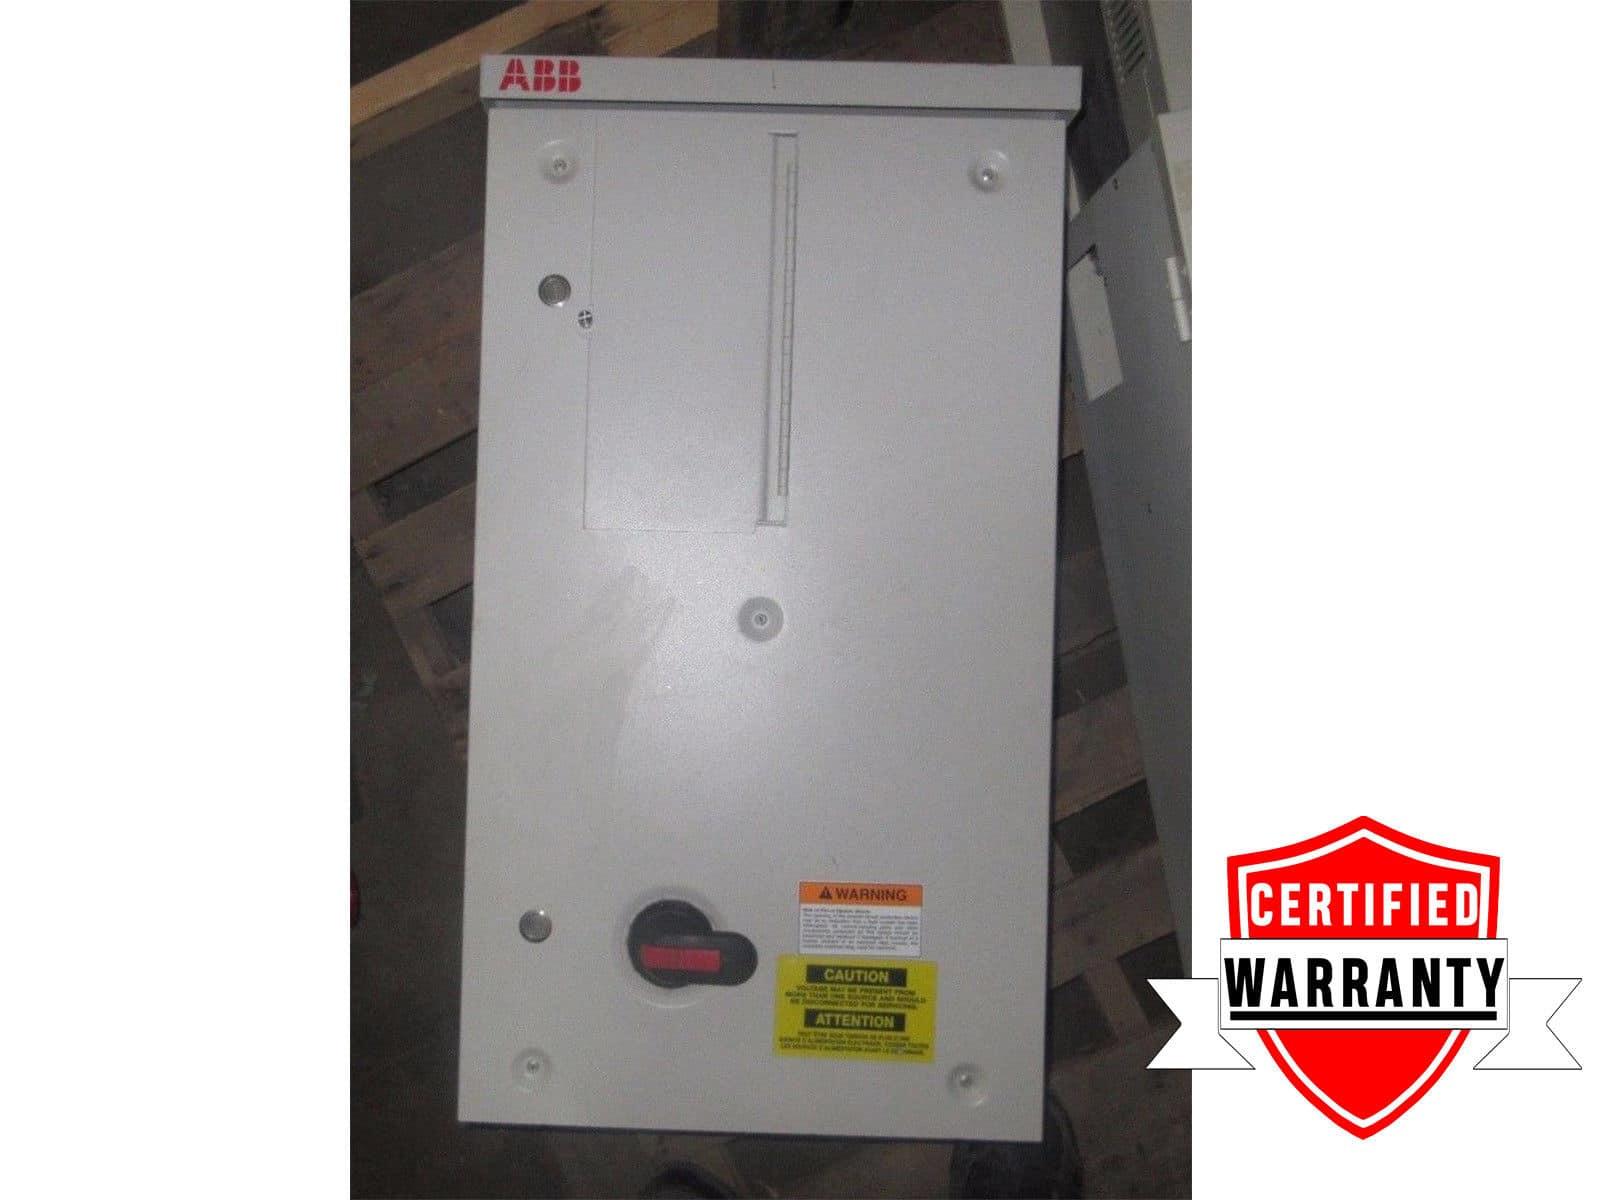 ABB ACH550-UH-023A-4+B055 HVAC Variable Frequency Drive 15HP NEMA 12 ø3 480VAC